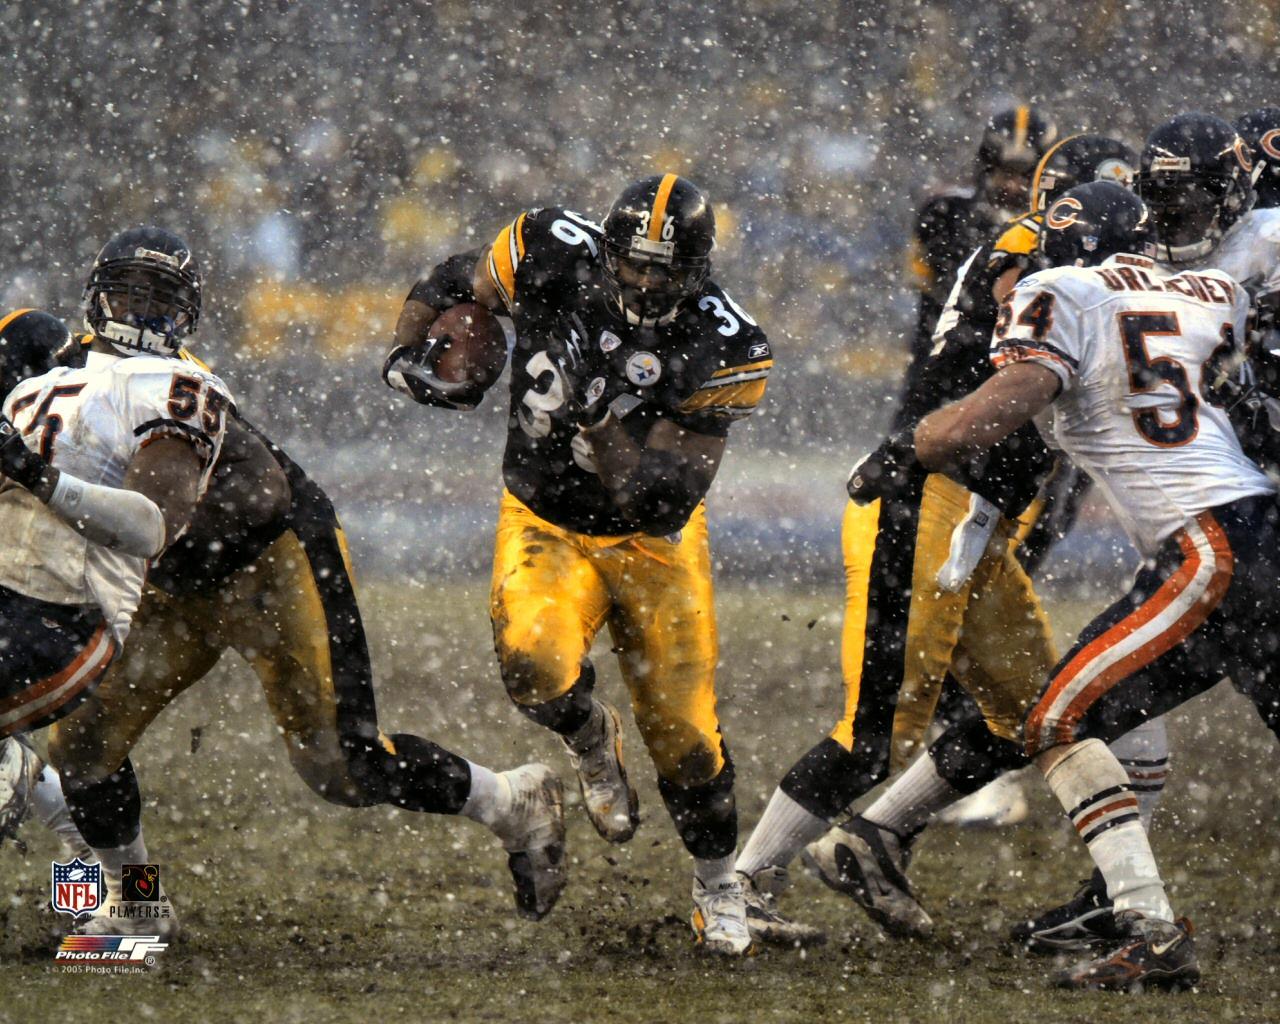 Jerome Bettis   Hall of Famer Plus Super Bowl XLIX 1280x1024